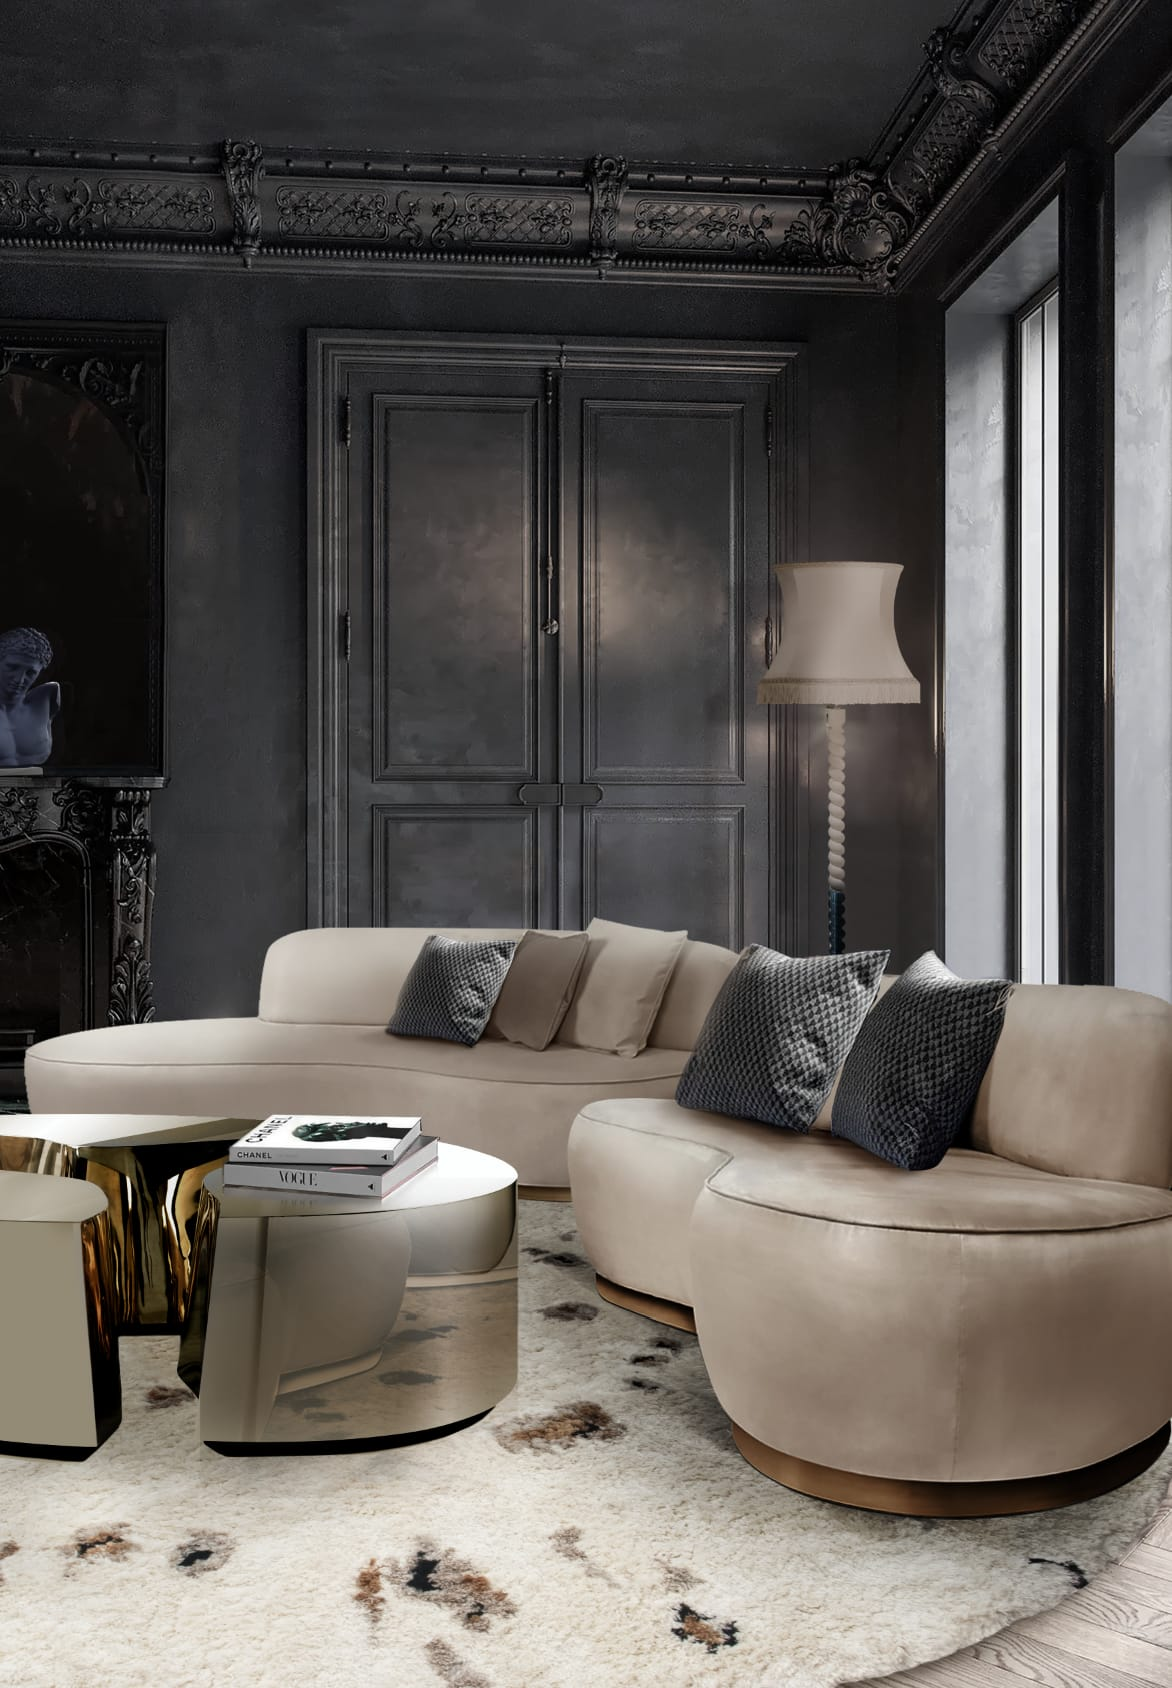 Insplosion_contemprorary-modern-dark-living-room-design-ideas_by_Bocadolobo